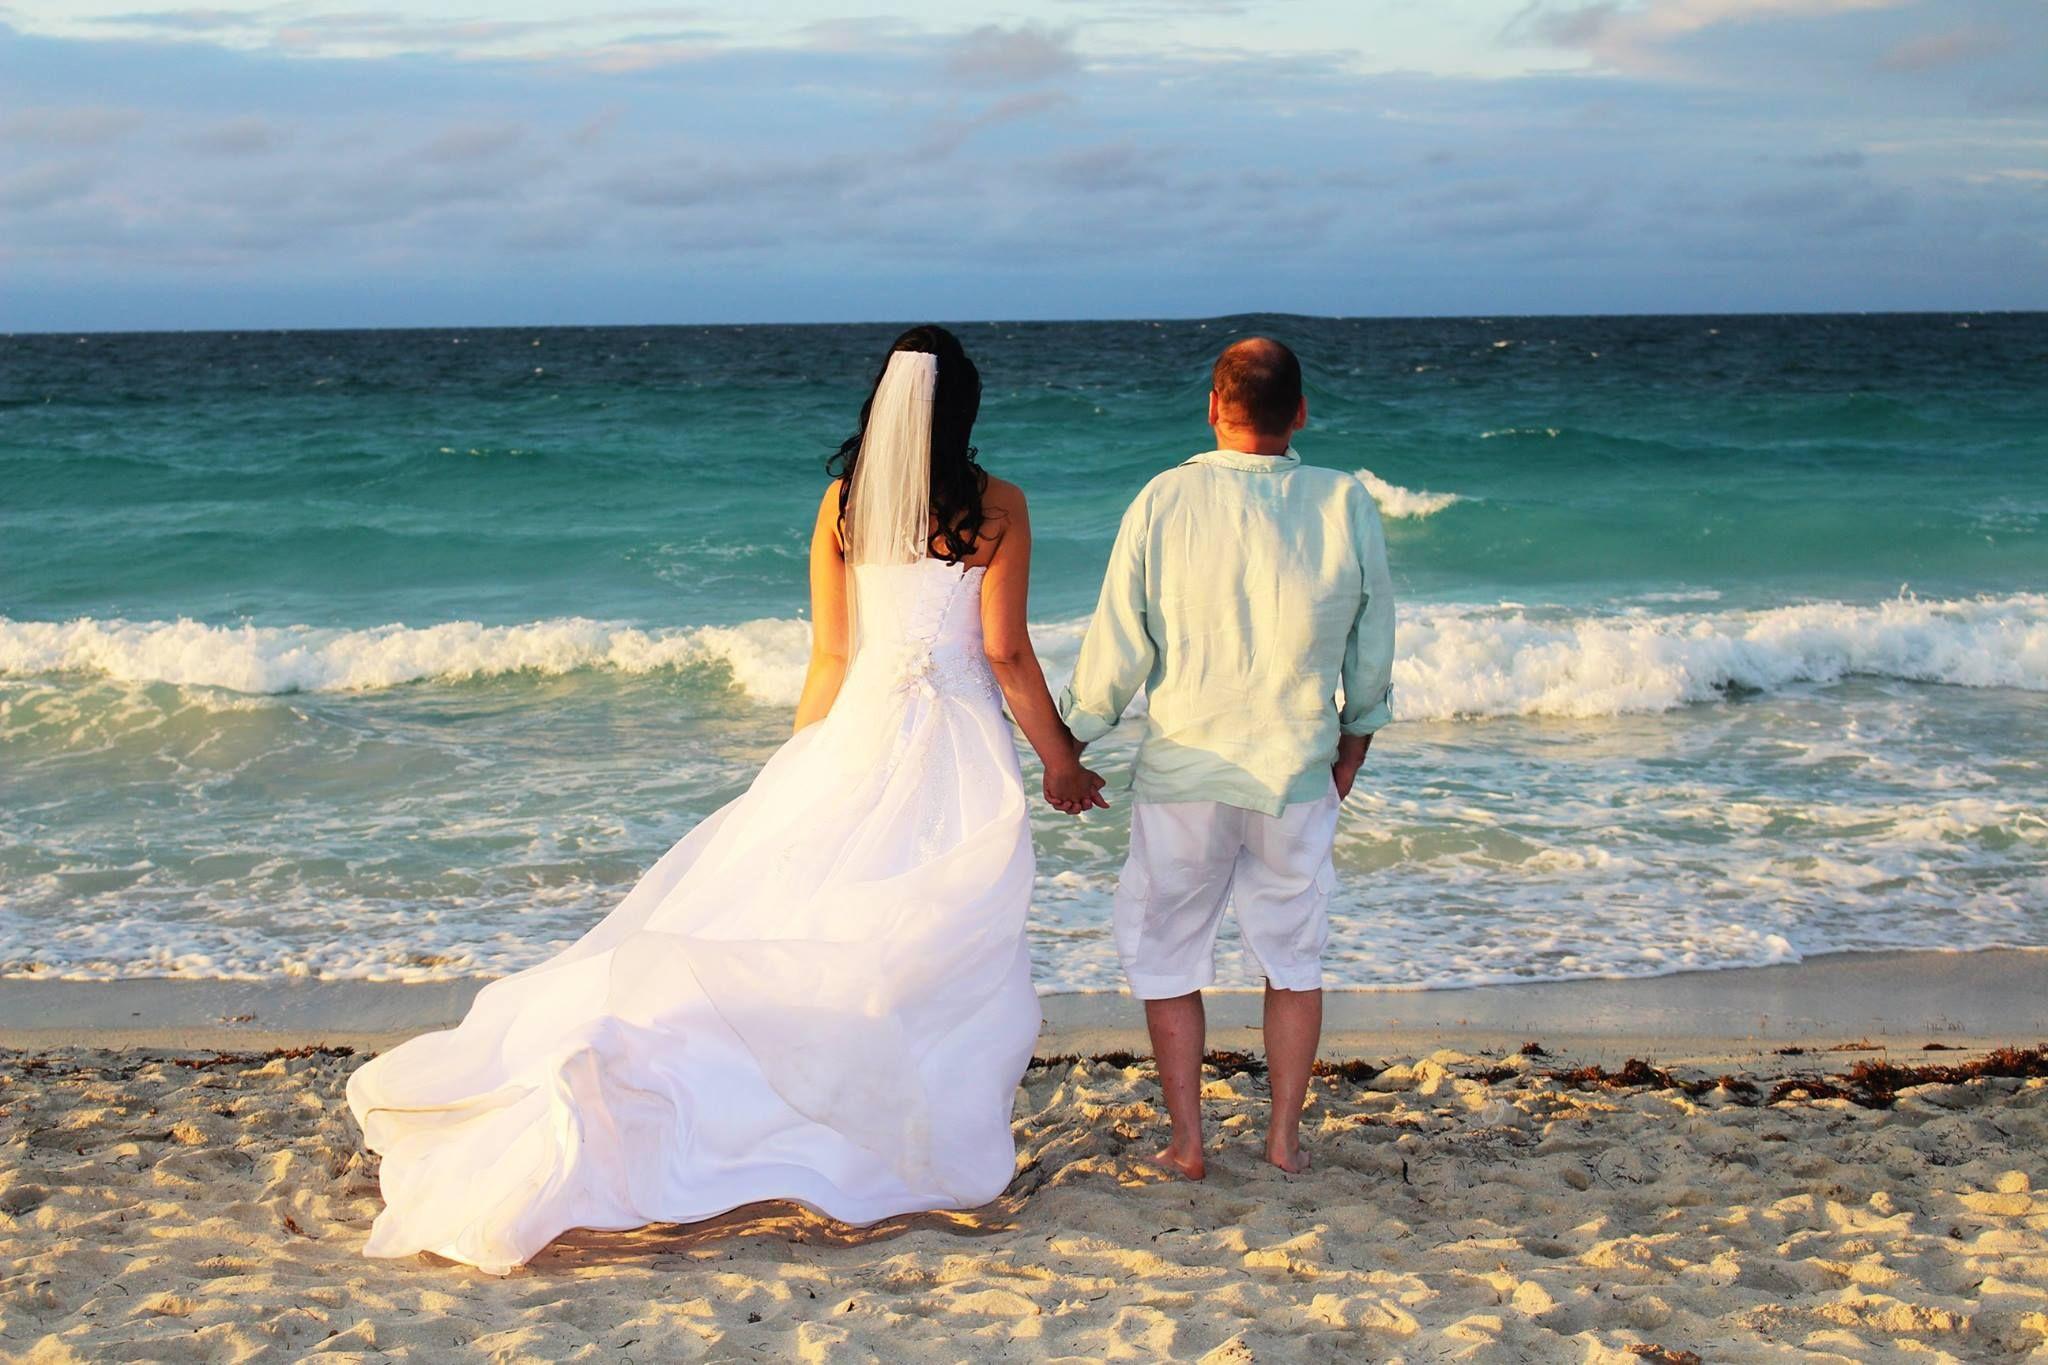 Linen Majorca Shirt | Majorca, Grooms and Beach weddings